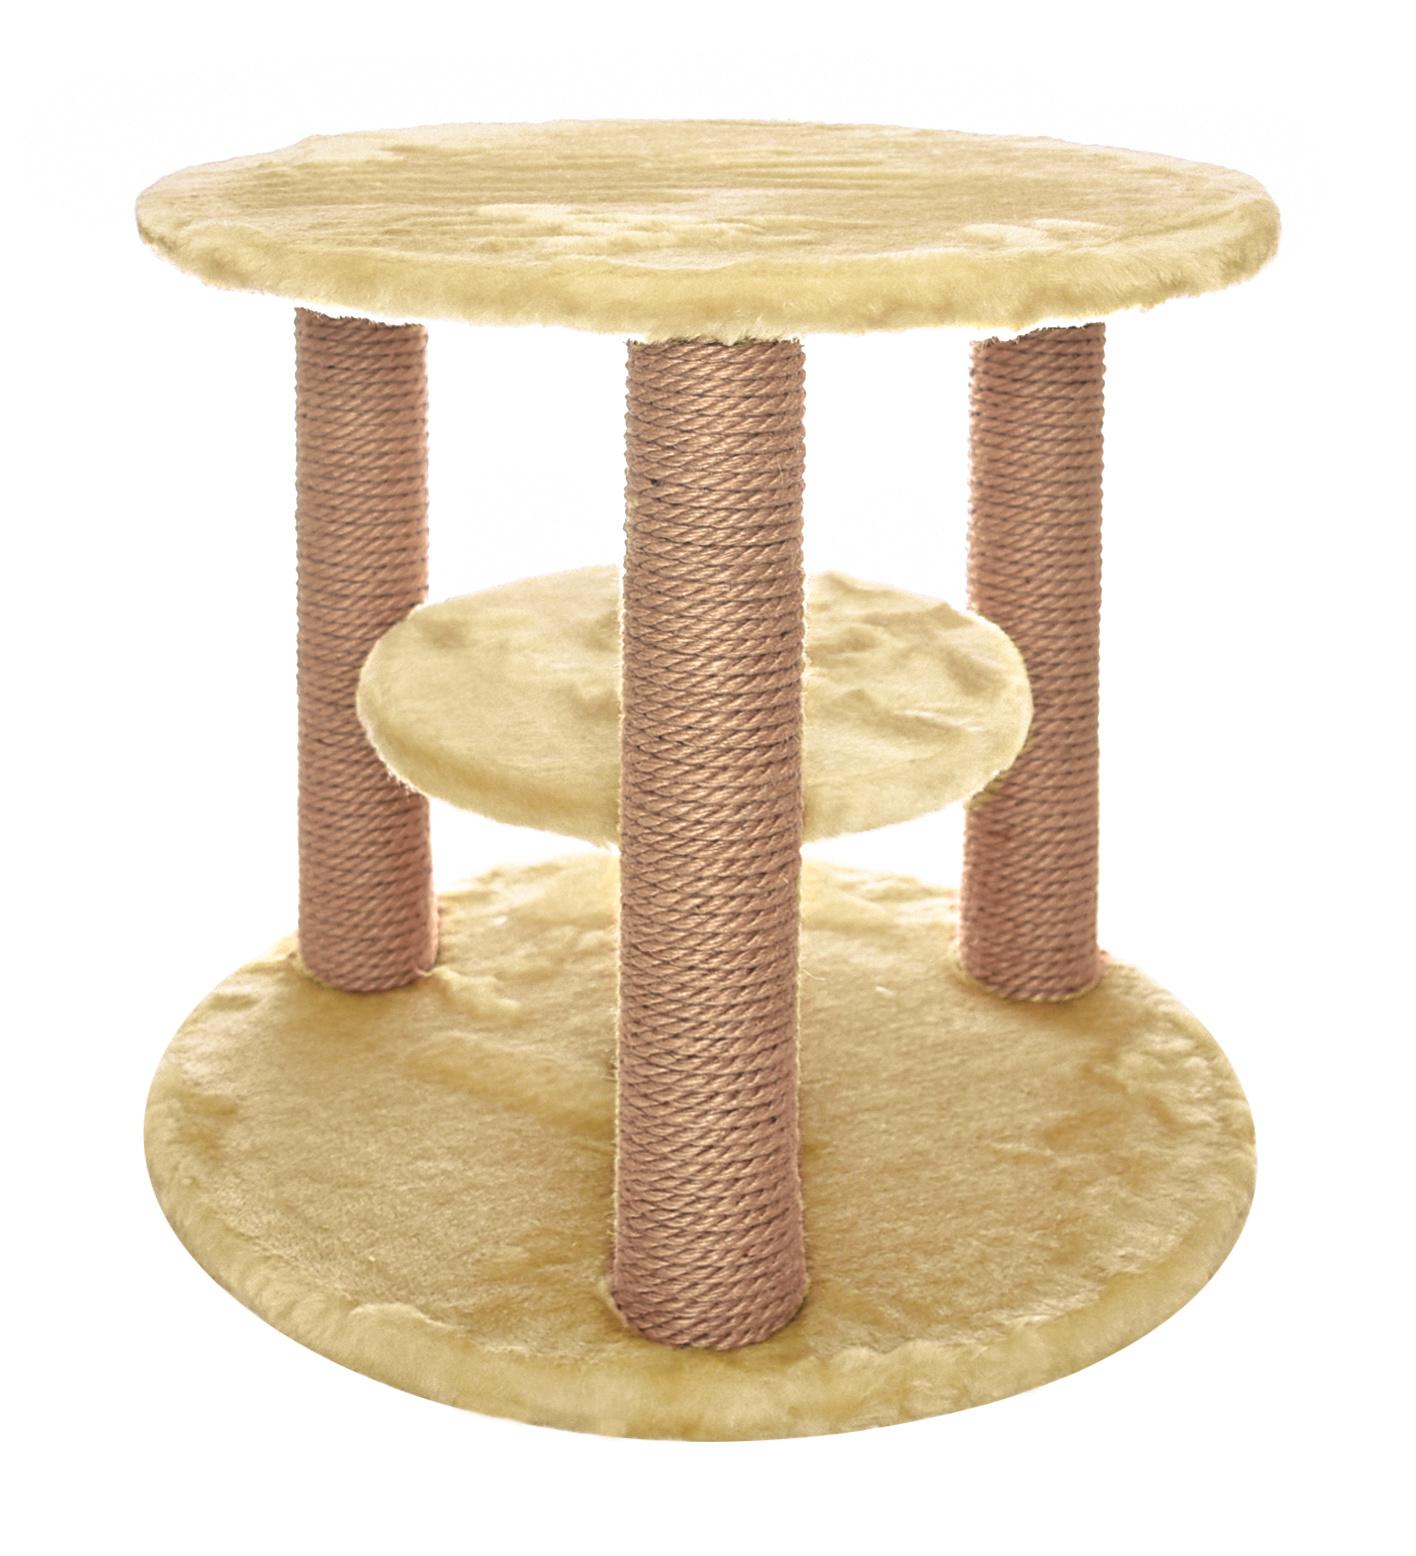 Yami-Yami Yami-Yami когтеточка Танго, джут, 50*48 см (8,1 кг) yami yami 1шт игрушка мячик пластмассовый для кошек 3 5см 2400 0 007 кг 2 шт